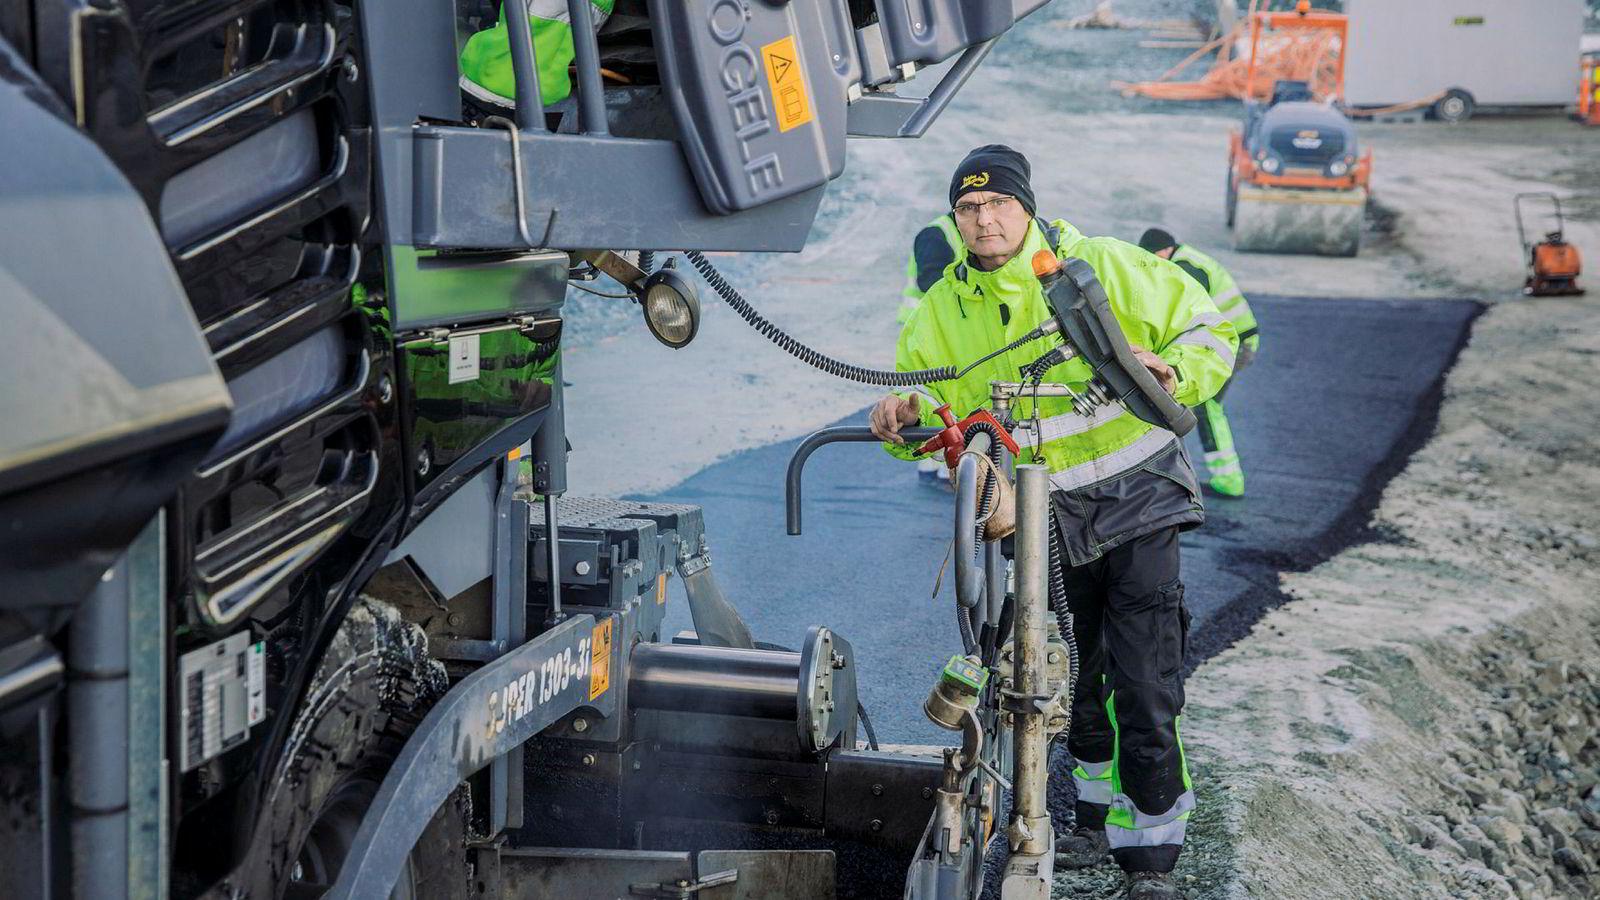 Asfaltleder Egil Ingebrigtsen hos gasellen Pedersen Brøyting i Tromsø.